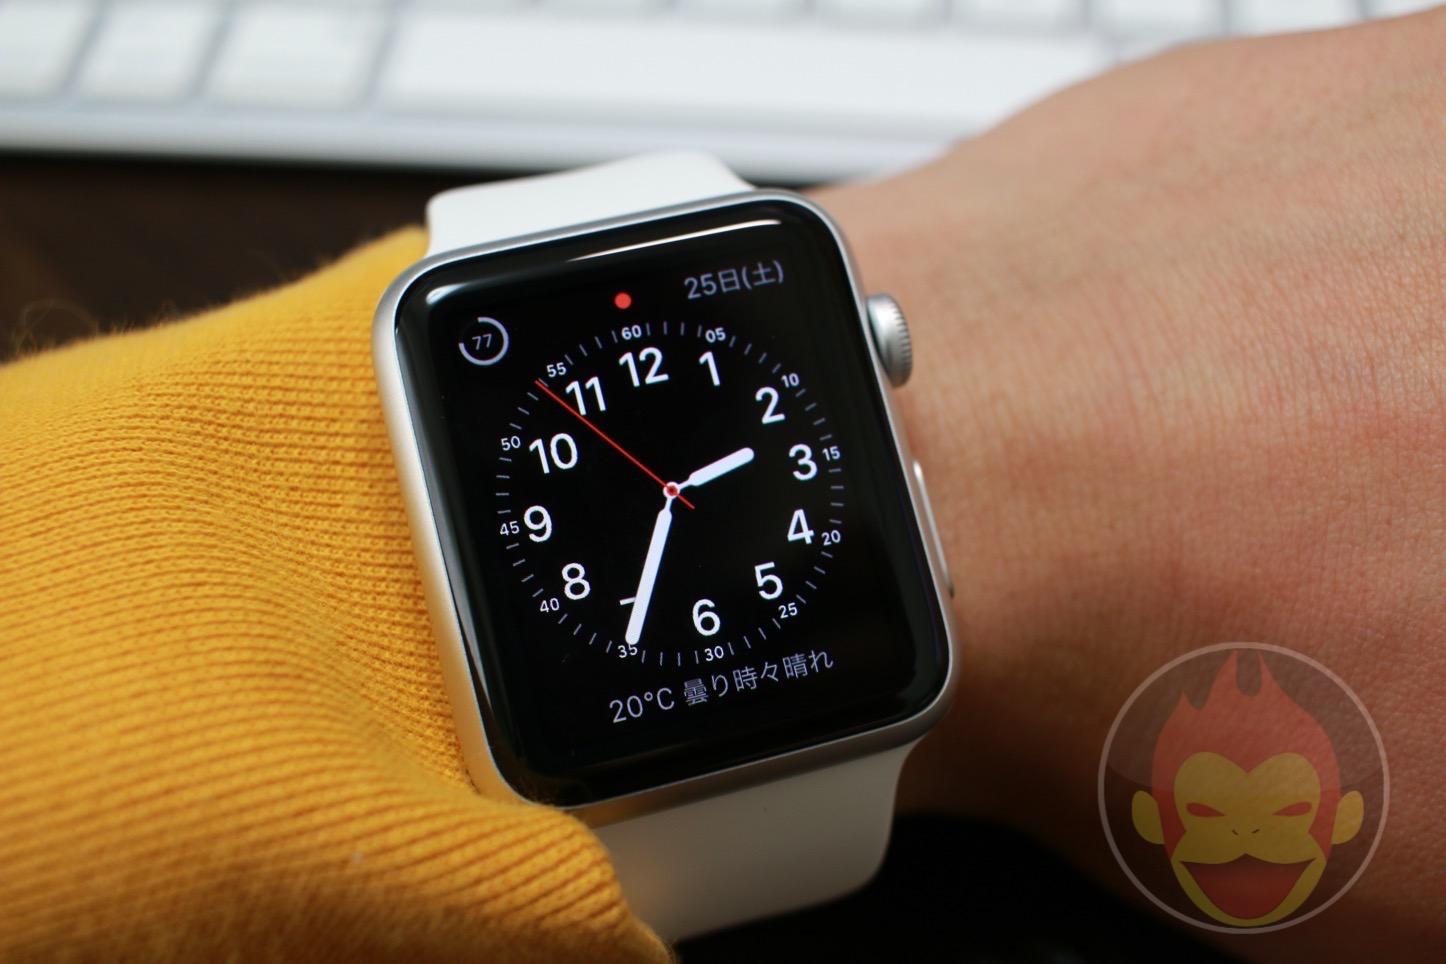 Apple-Watch-Battery-Usage-10.JPG